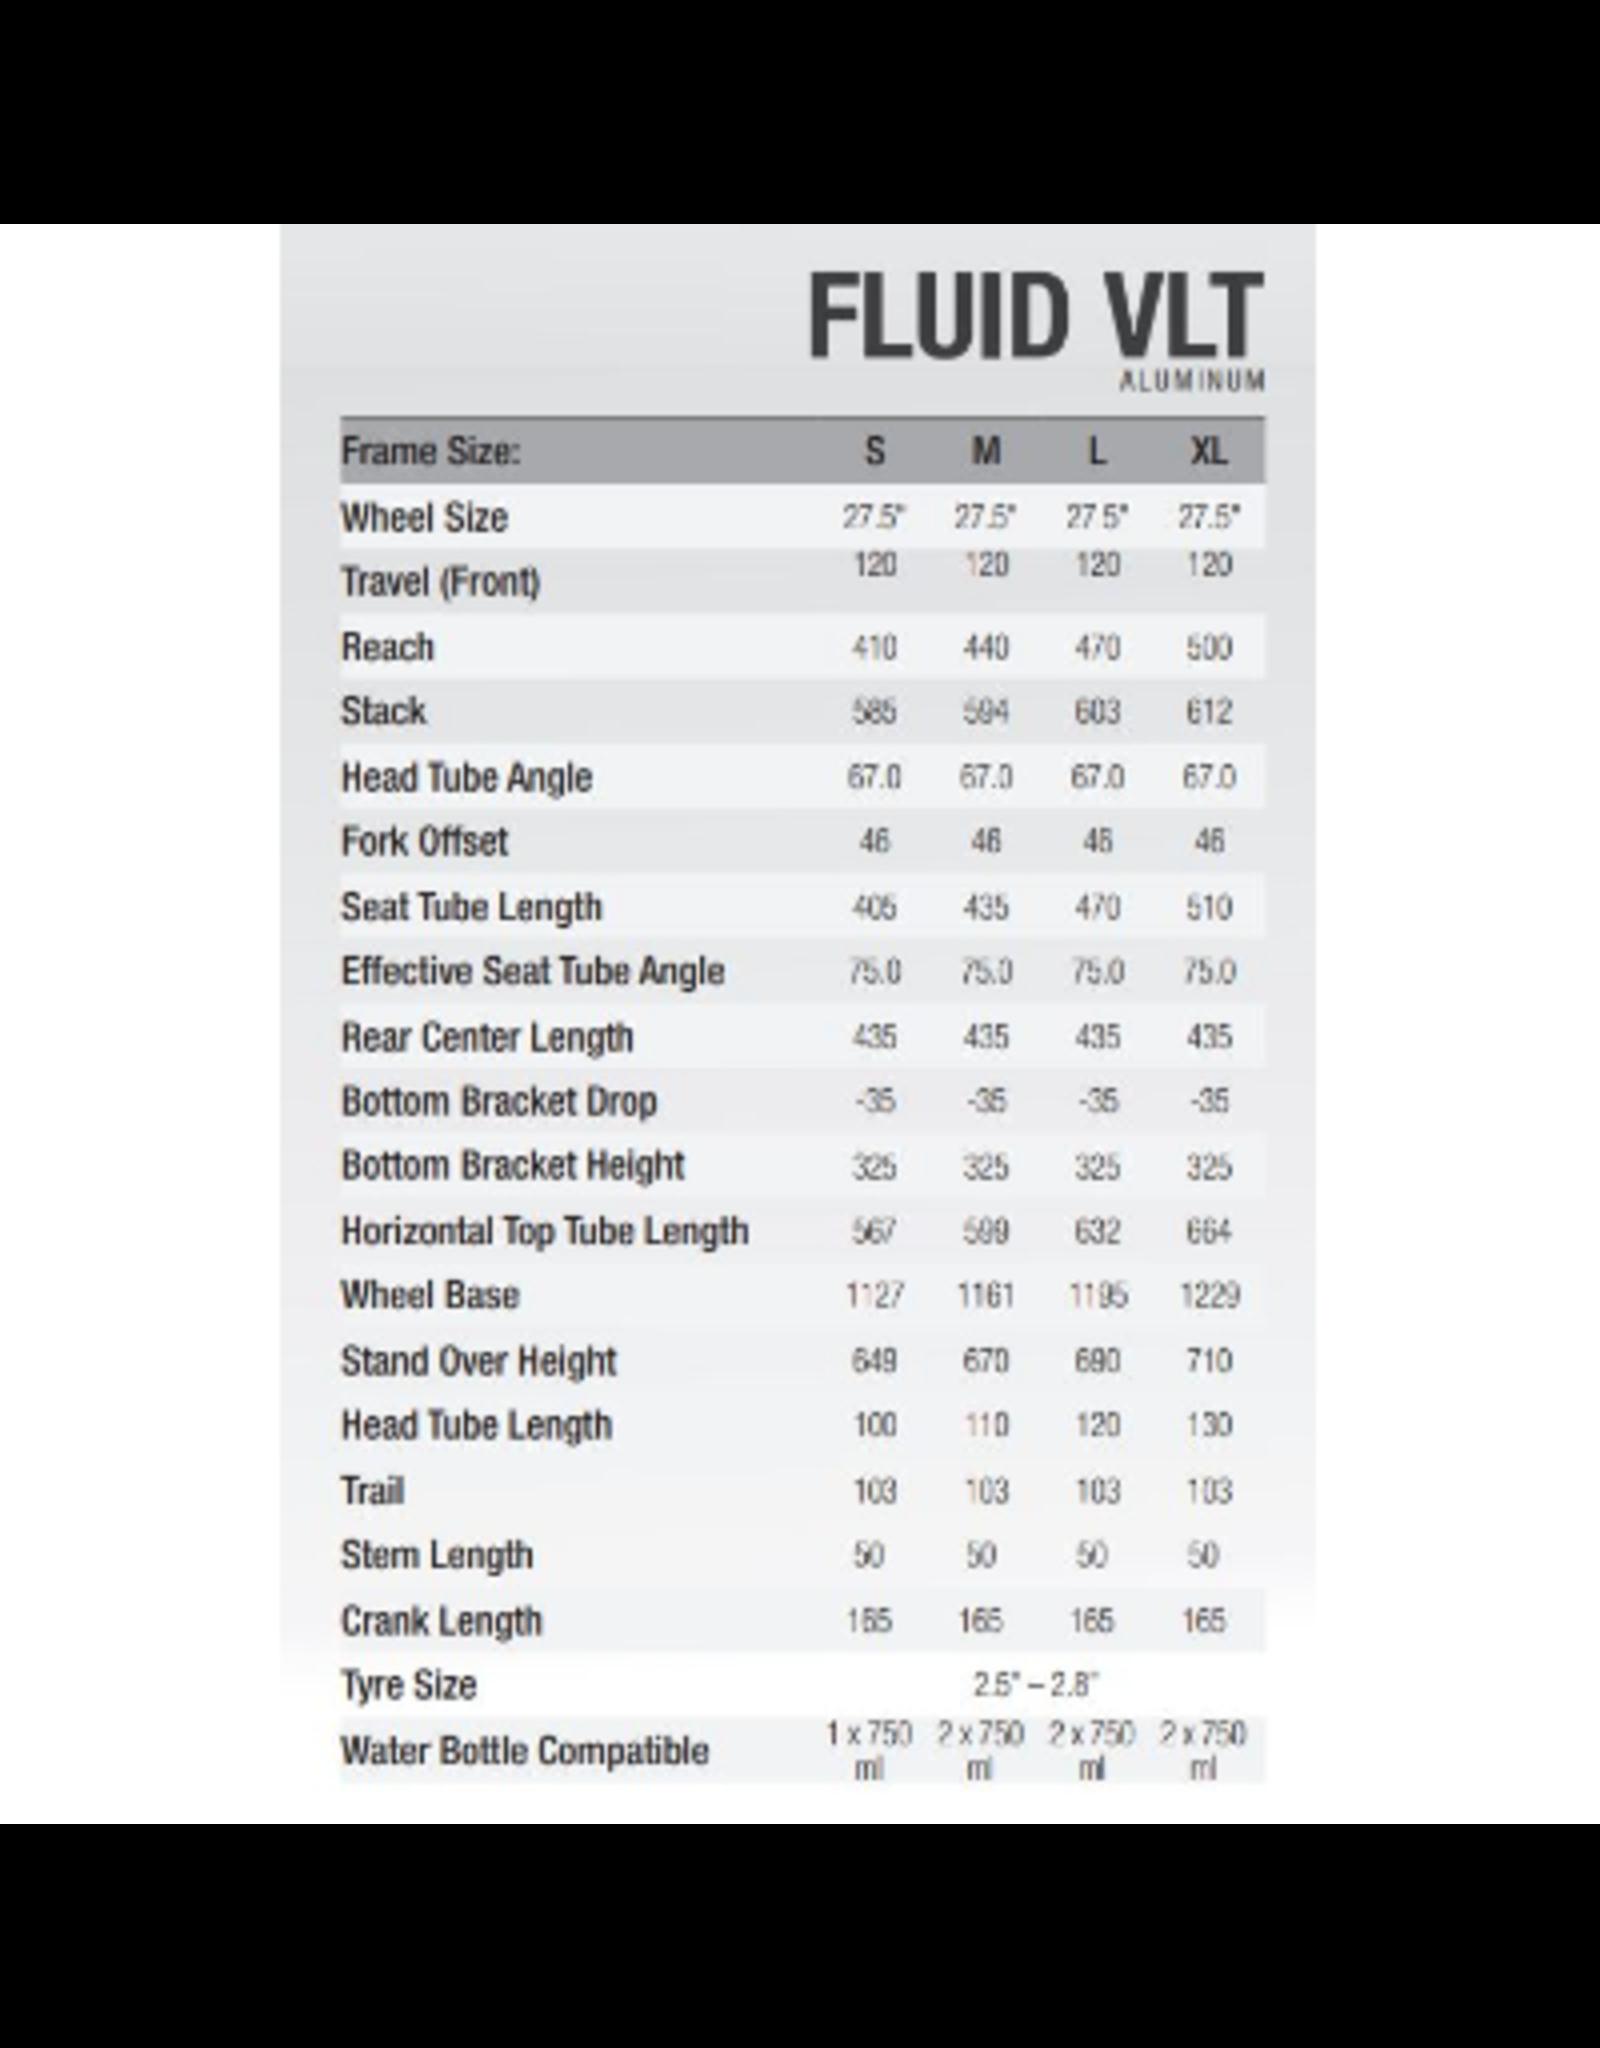 NORCO NORCO FLUID VLT 2 (27) CHARCOAL (E-BIKE)